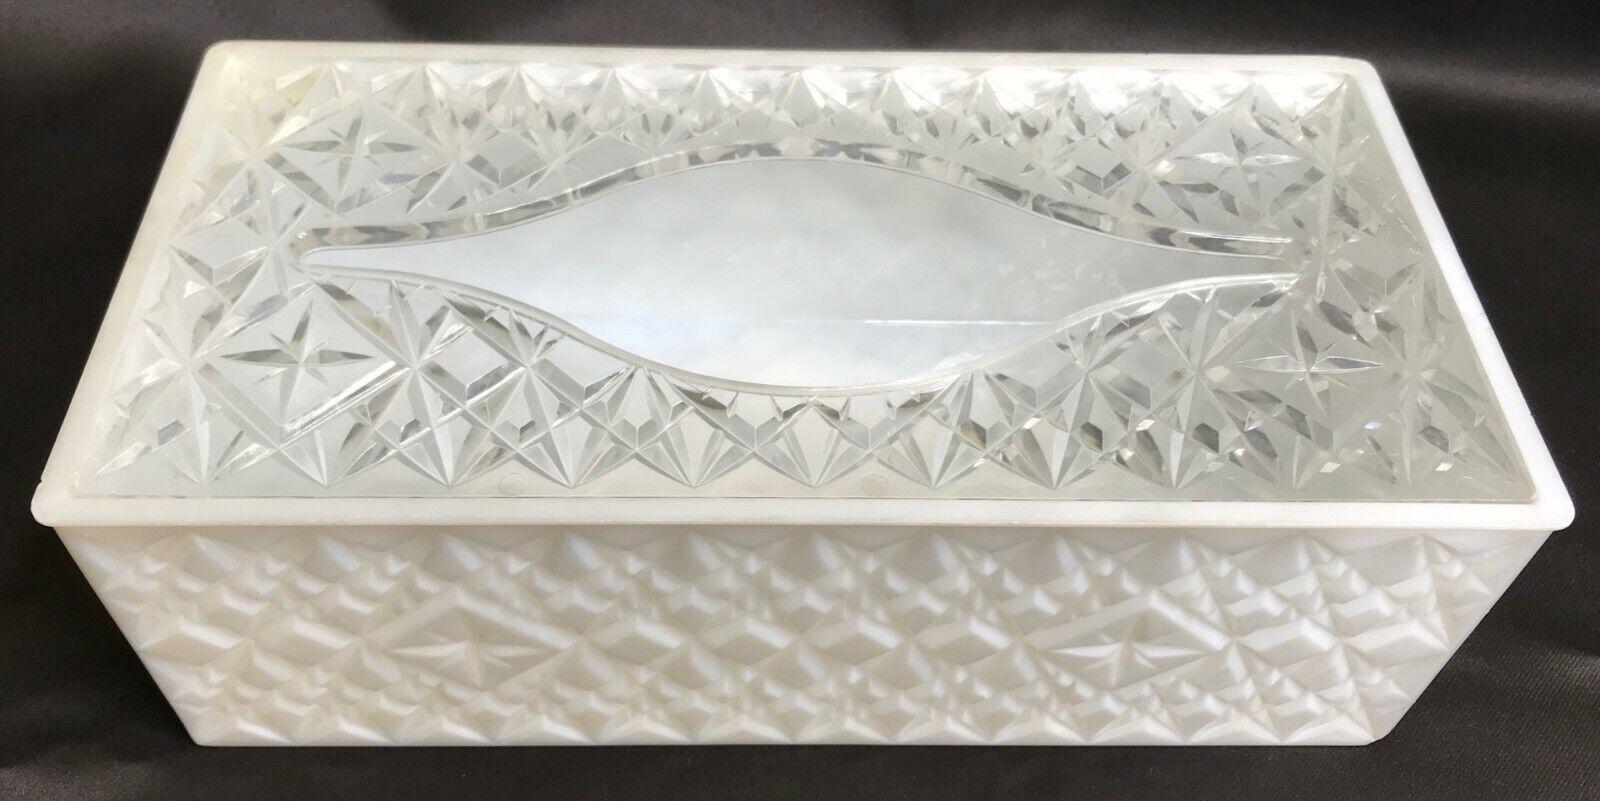 VTG Tissue Box Cover Plastic White Clear Quilted Diamond Starburst Lucite MCM